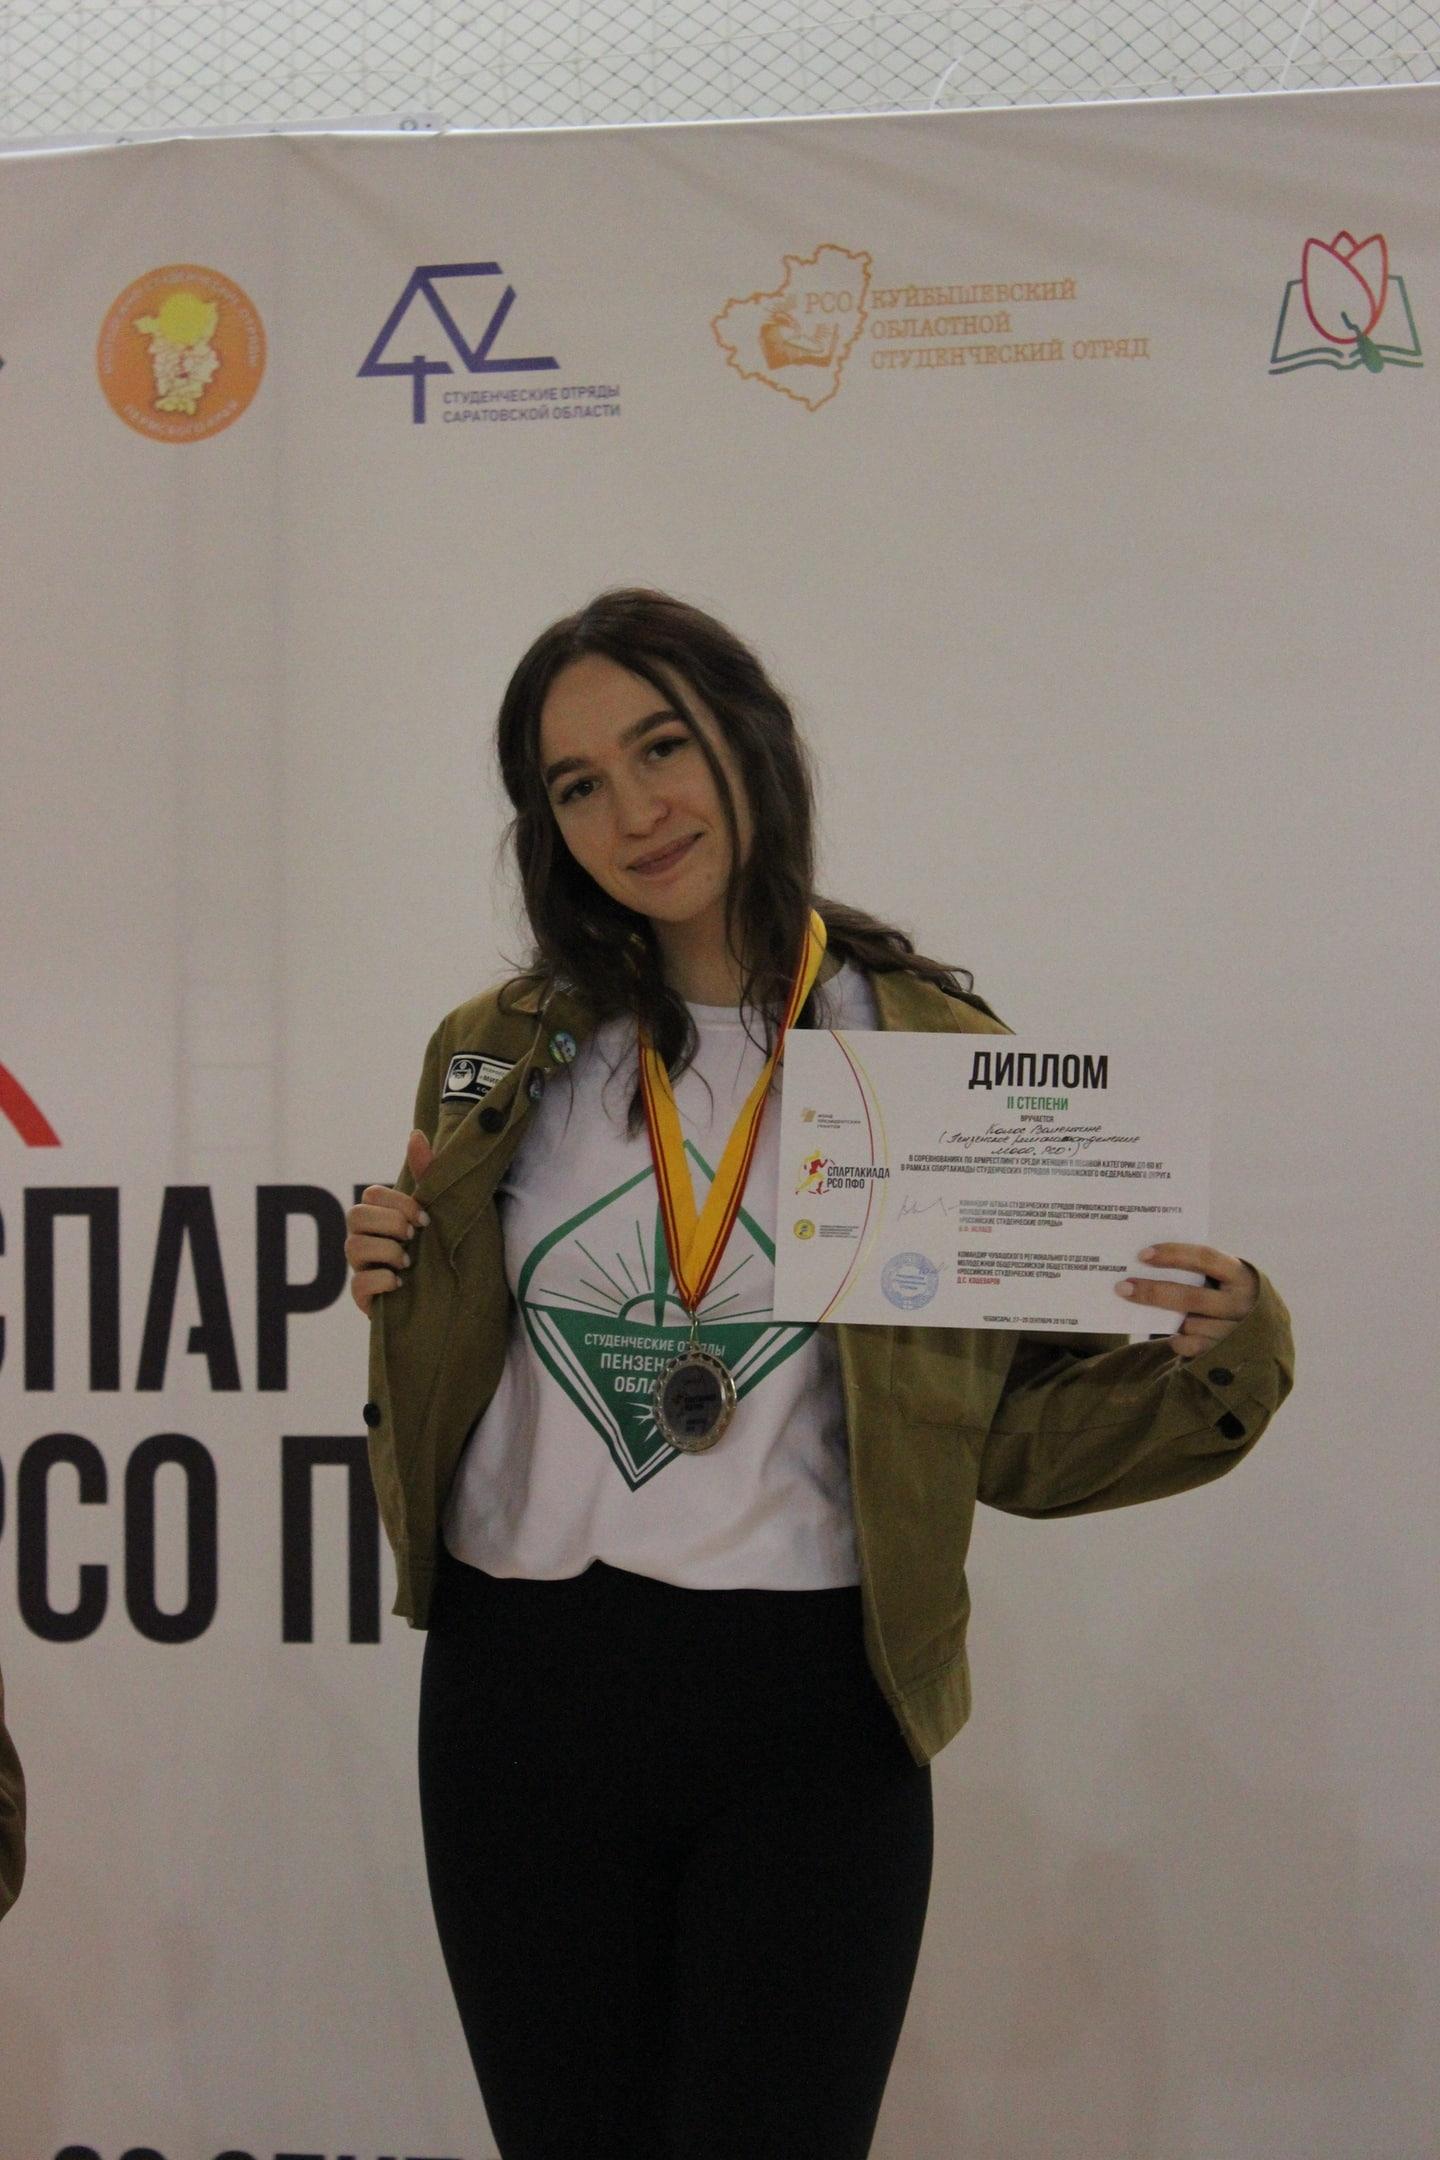 Сборная Пензенского РО взяла 3 место на V Спартакиаде СО ПФО, изображение №5